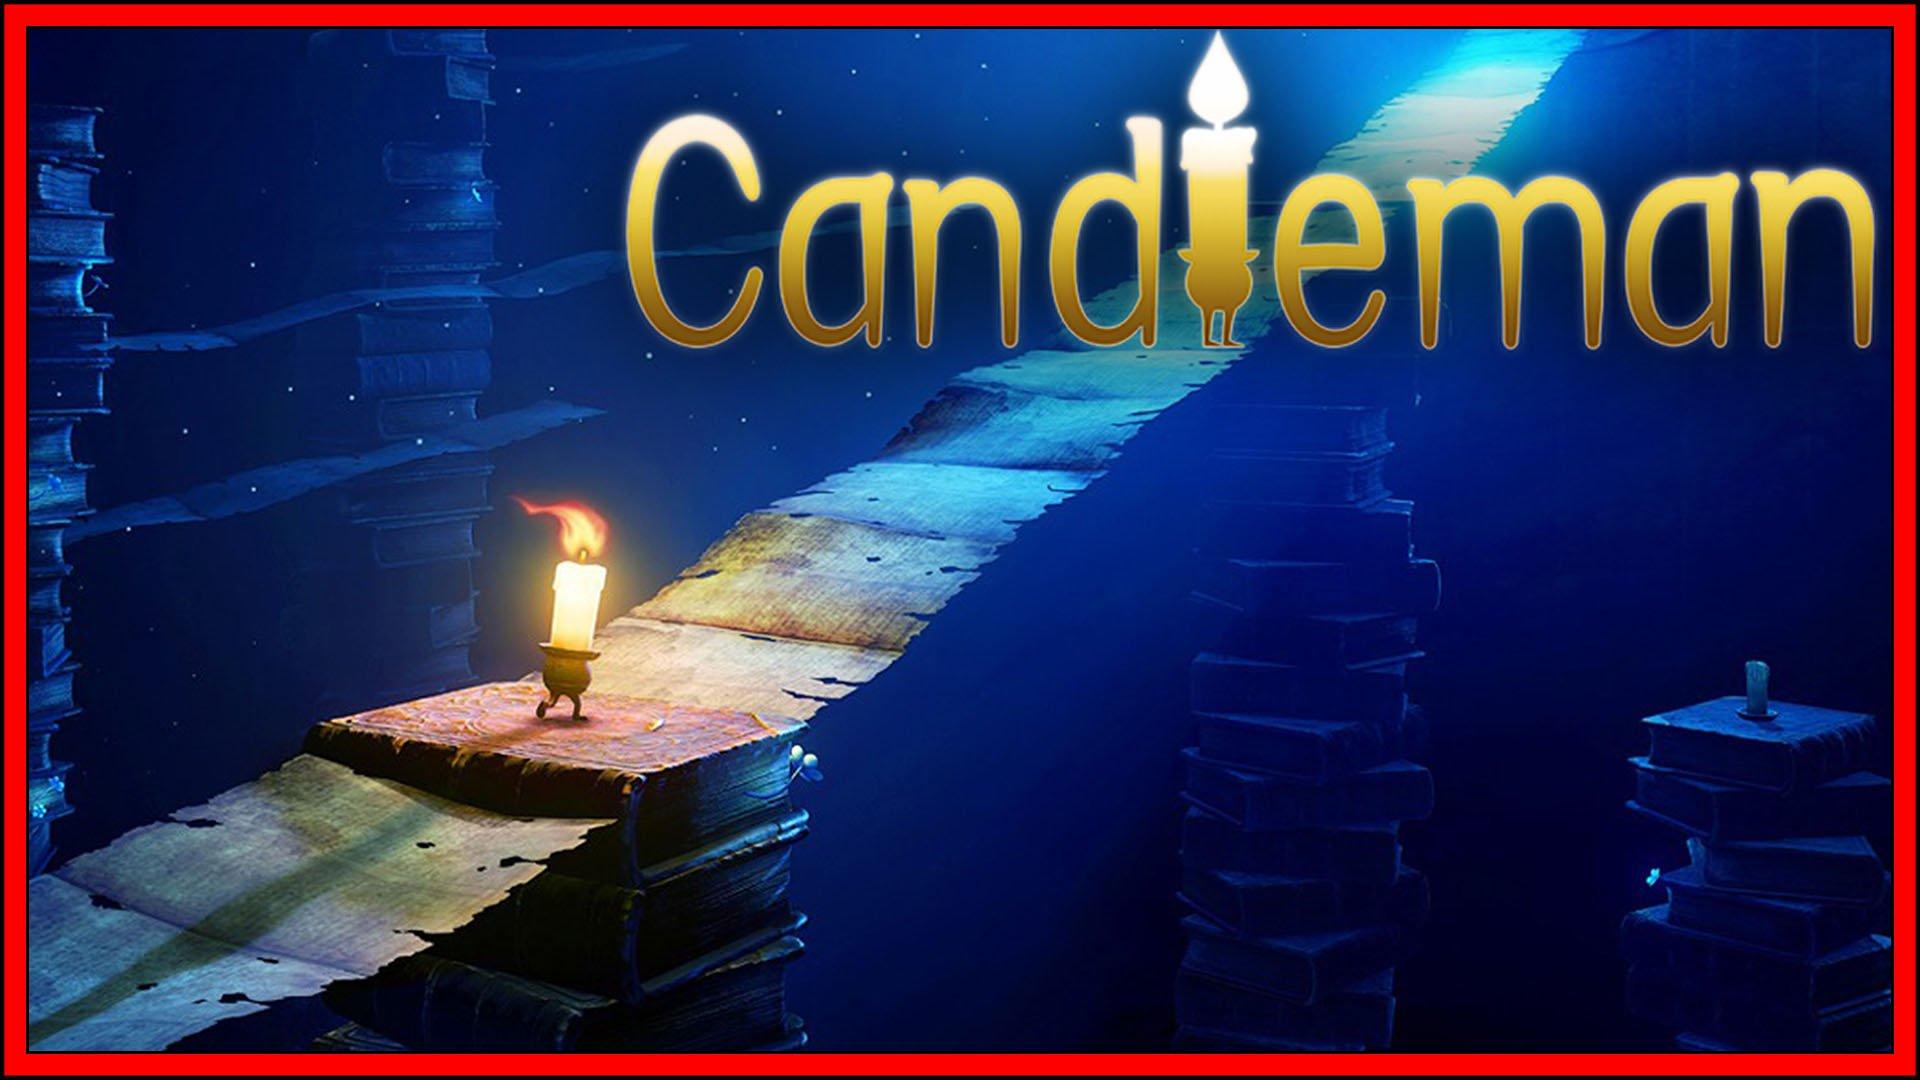 Candleman Switch Fi3